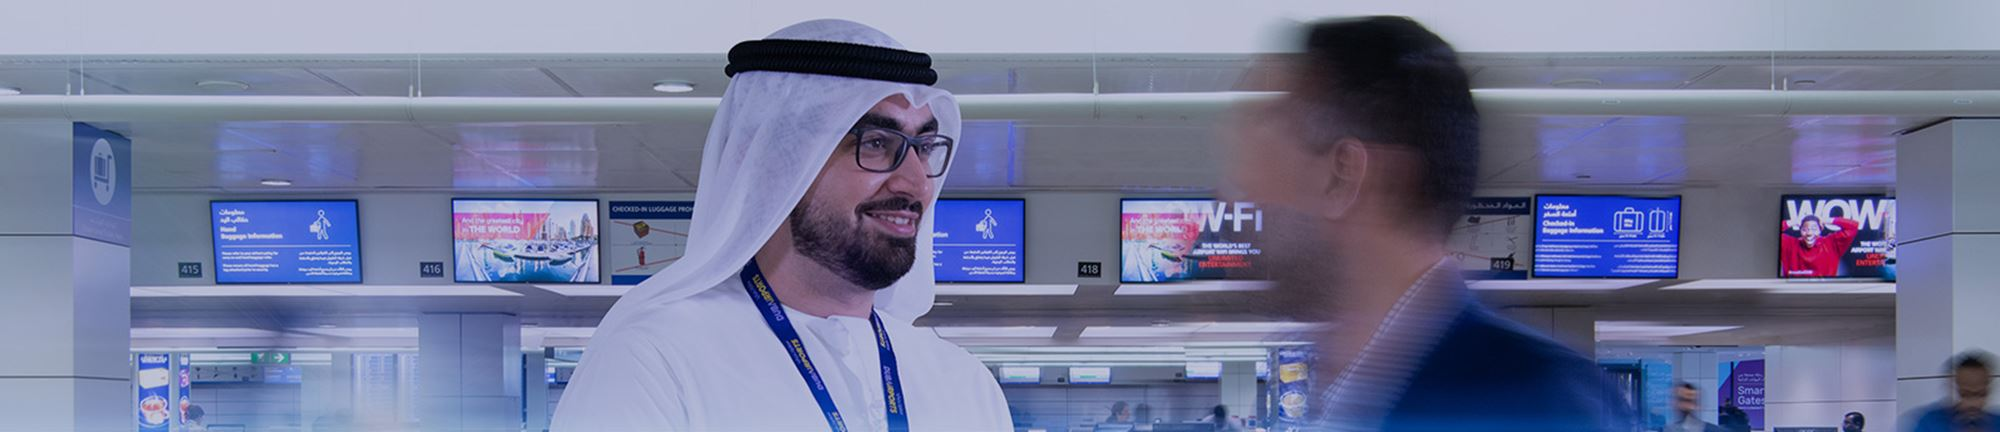 Fire Services | Dubai Airports